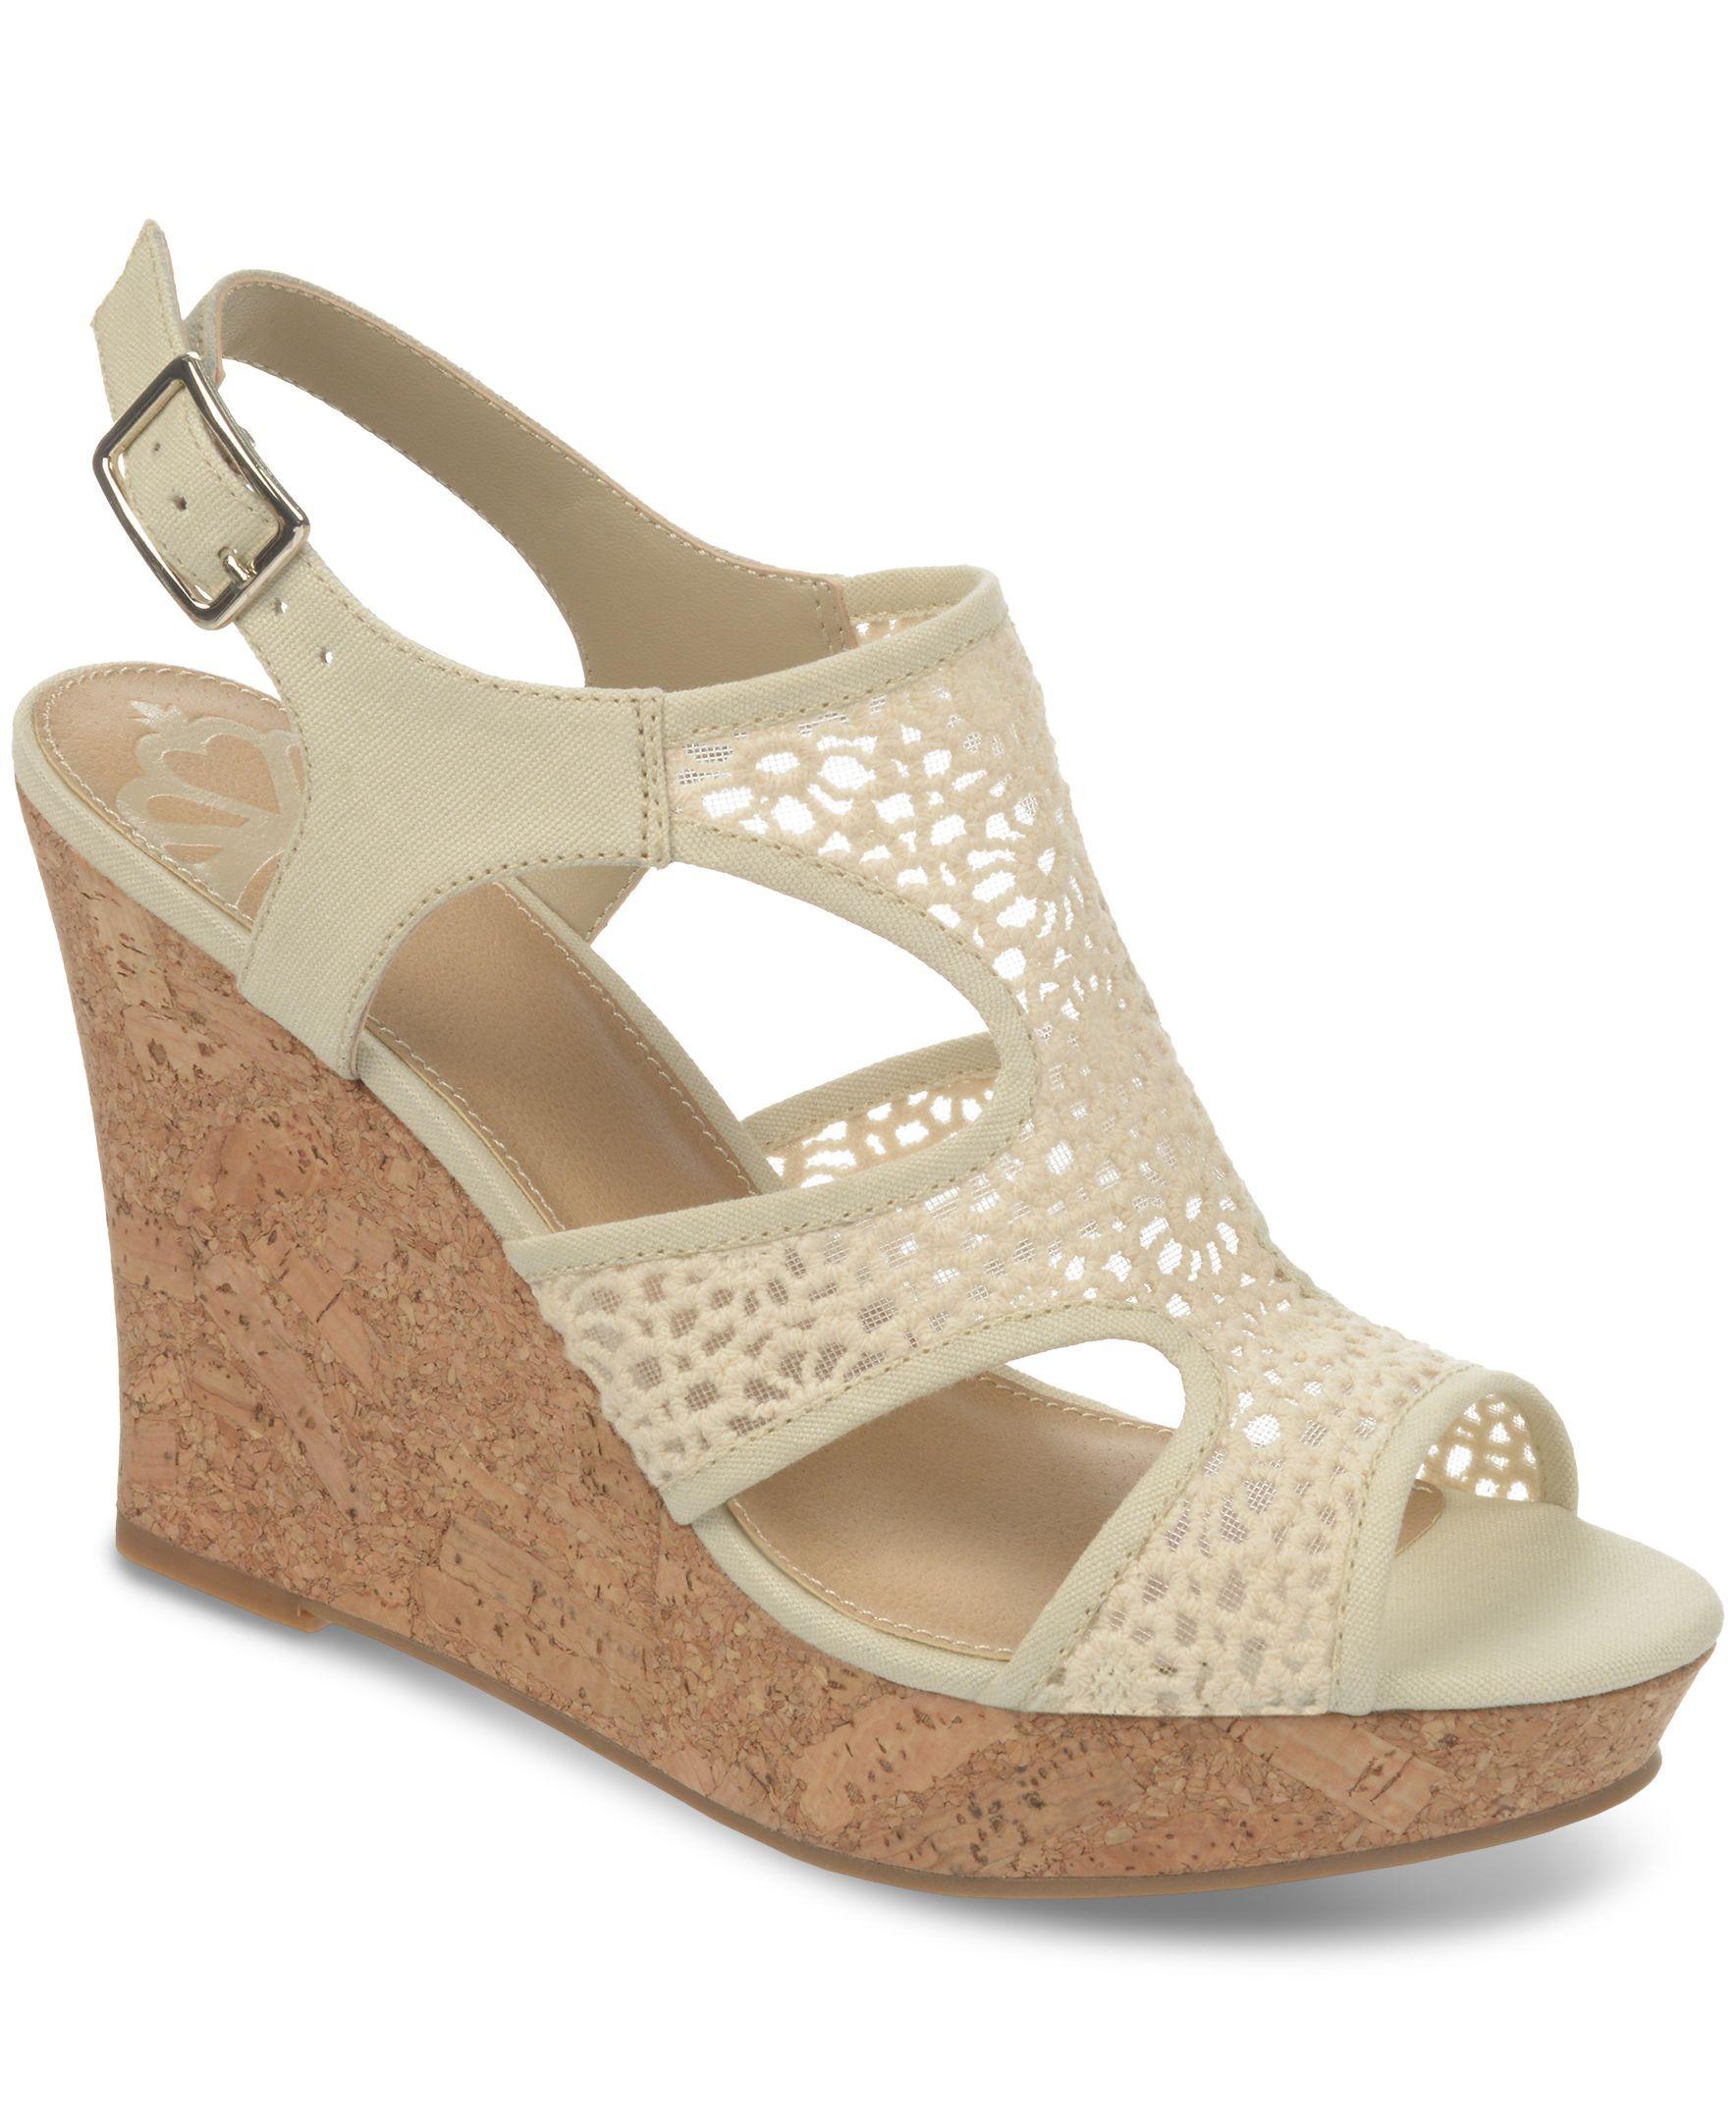 Fergalicious Kammi Crochet Platform Wedge Sandals